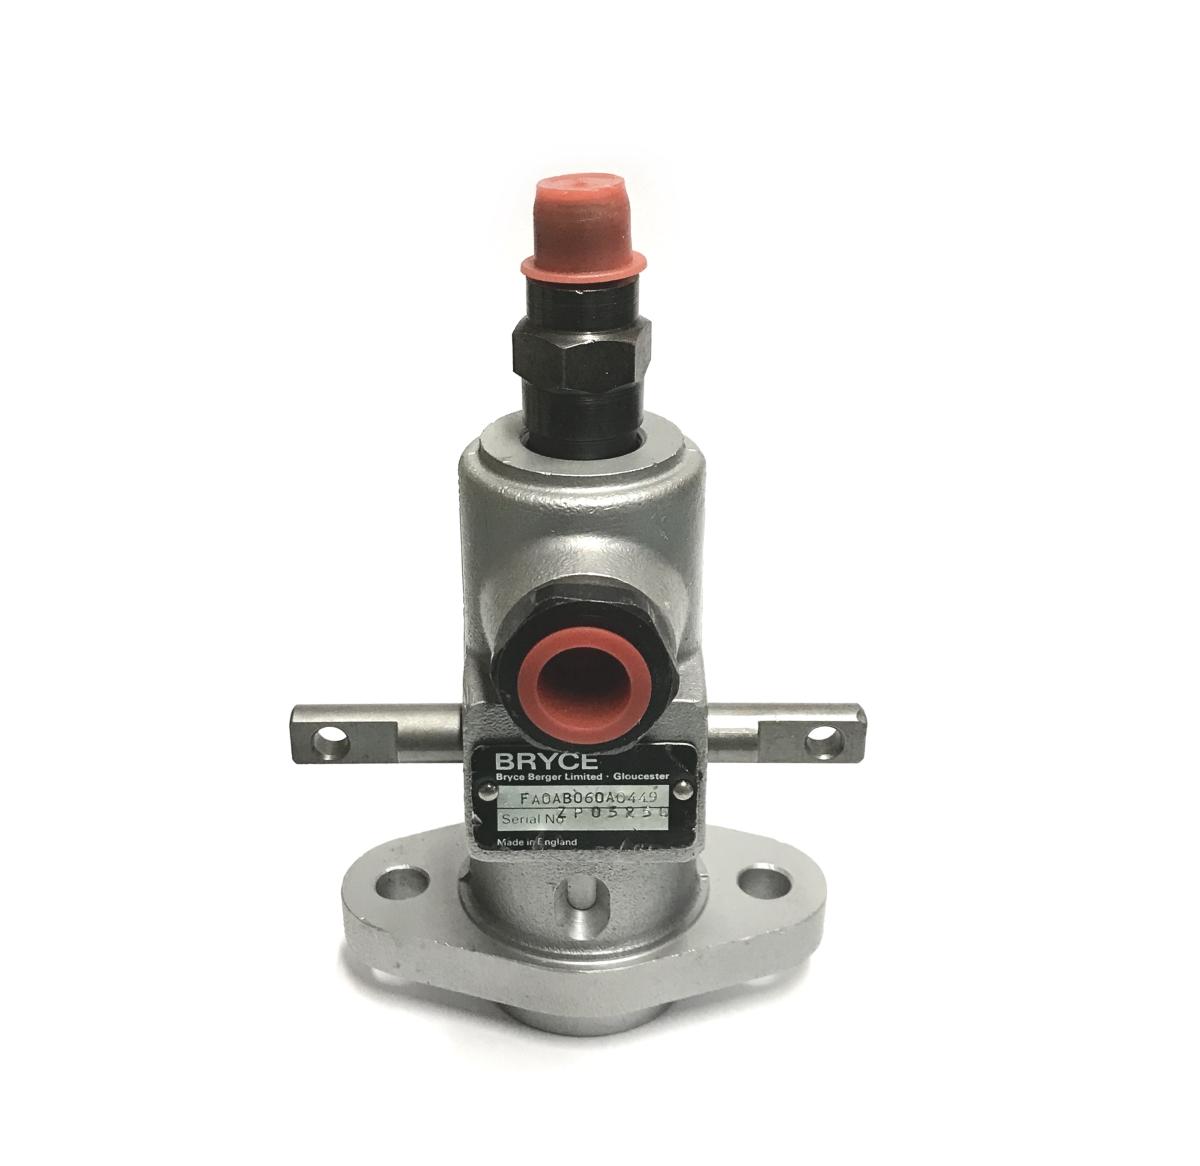 Lister Petter Fuel Pumps